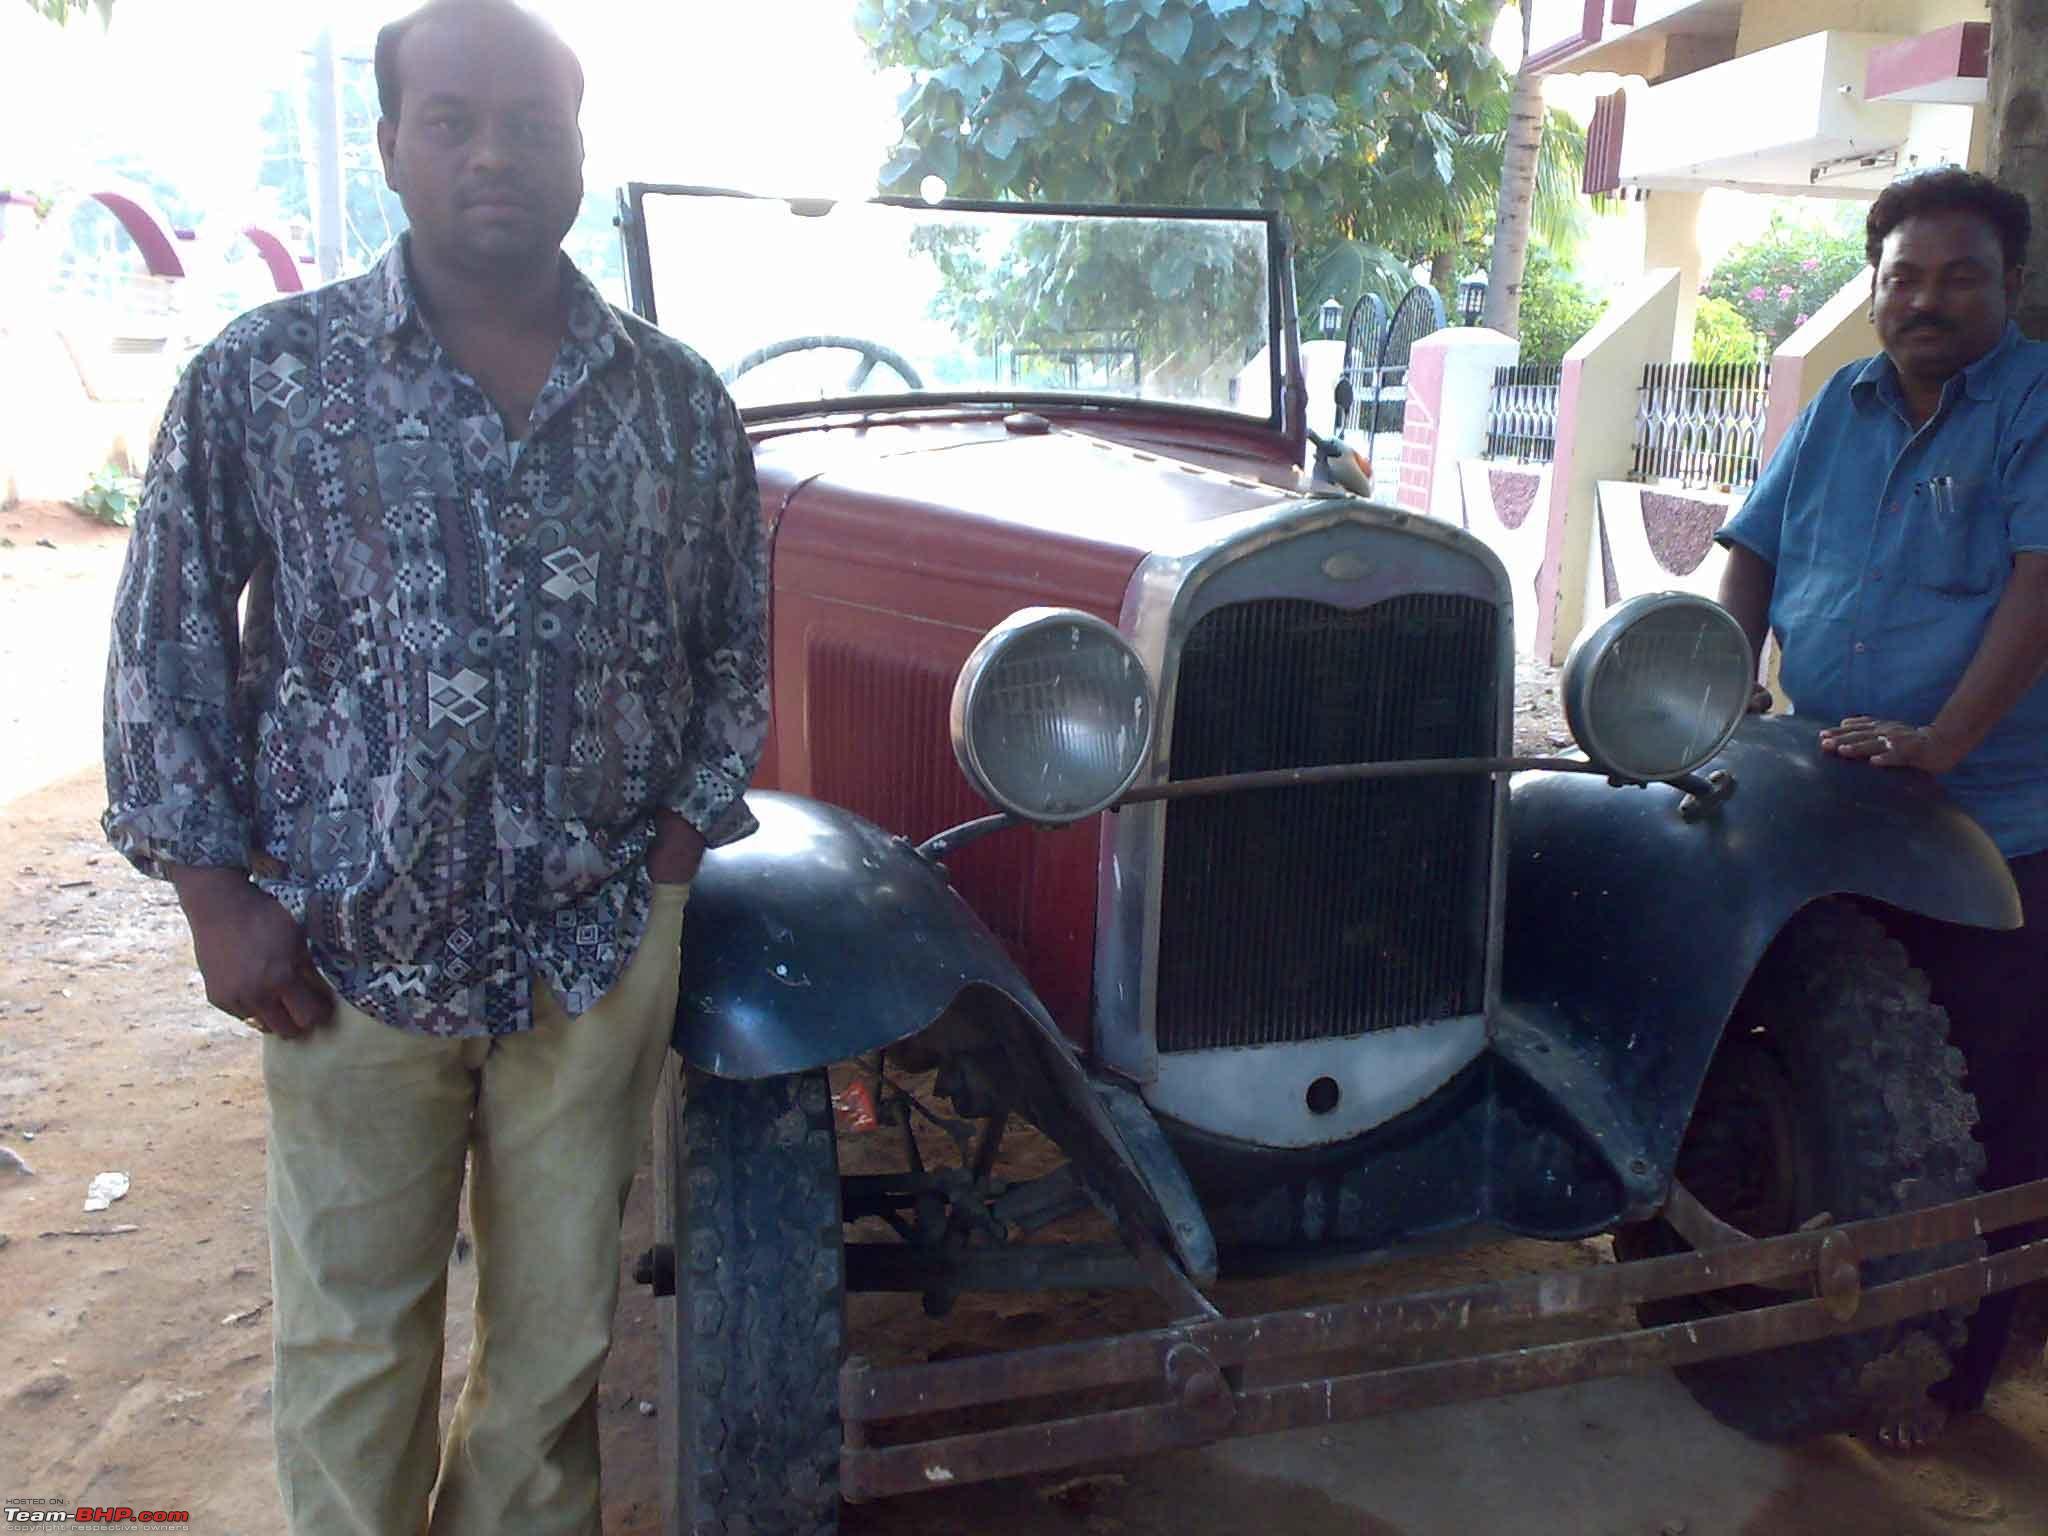 Restoring a 1930 Ford Model A